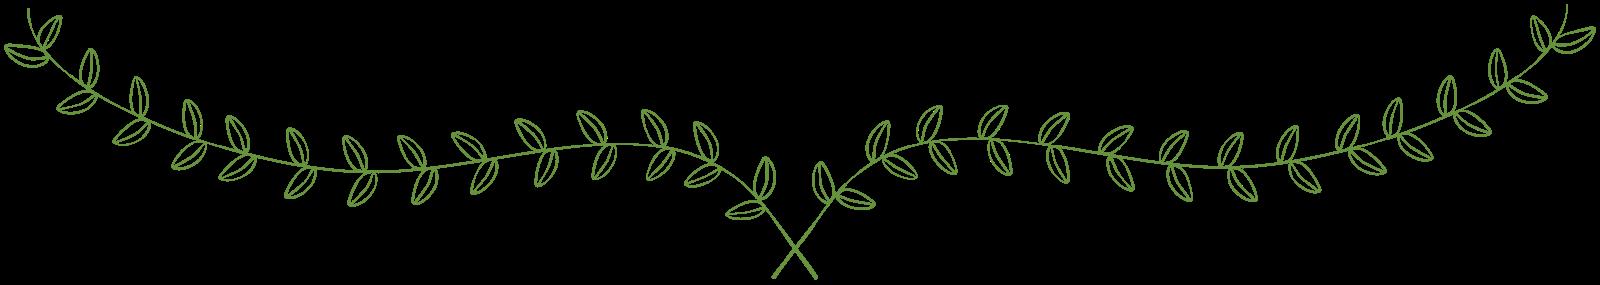 Free laurel frames arrows. Vines clipart calligraphy